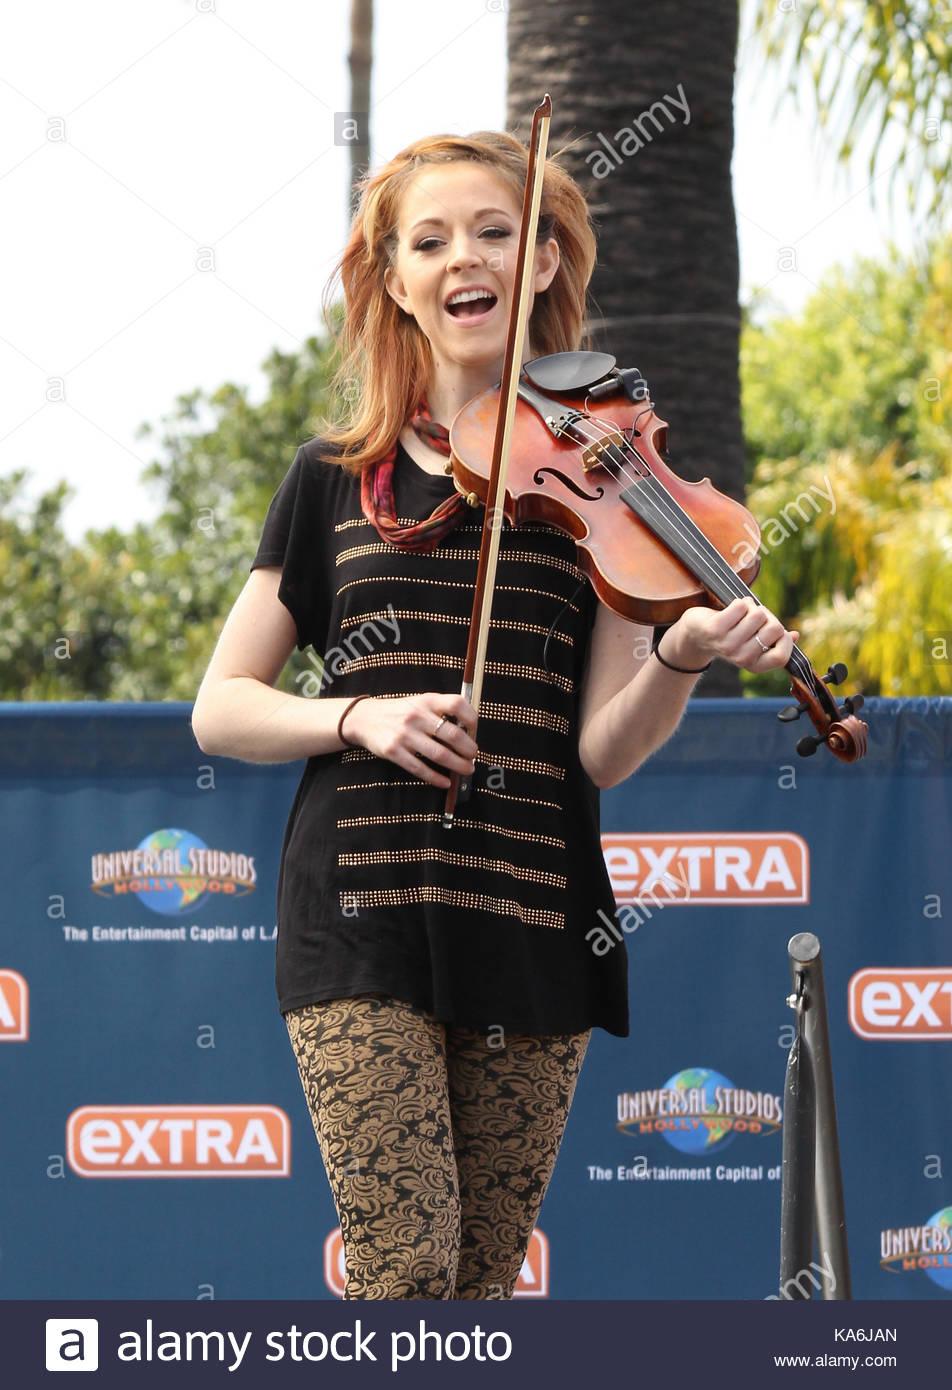 lindsey stirling lindsey stirling plays the violin for a crowd of